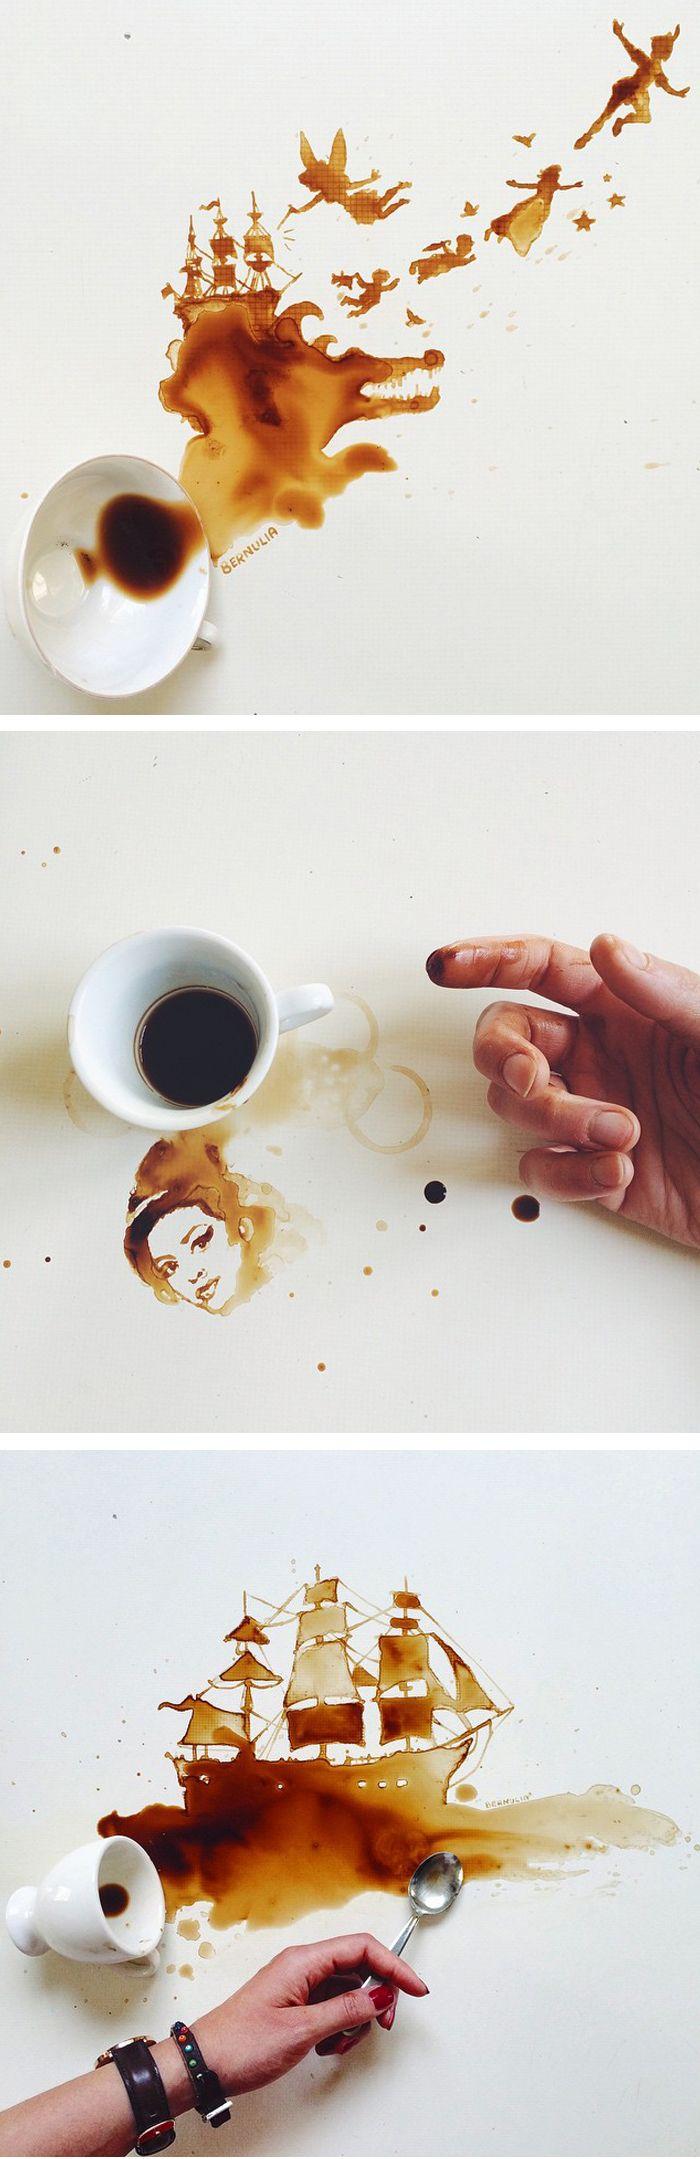 Coffe art by Giulia Bernardelli | coffee painting | unconventional art